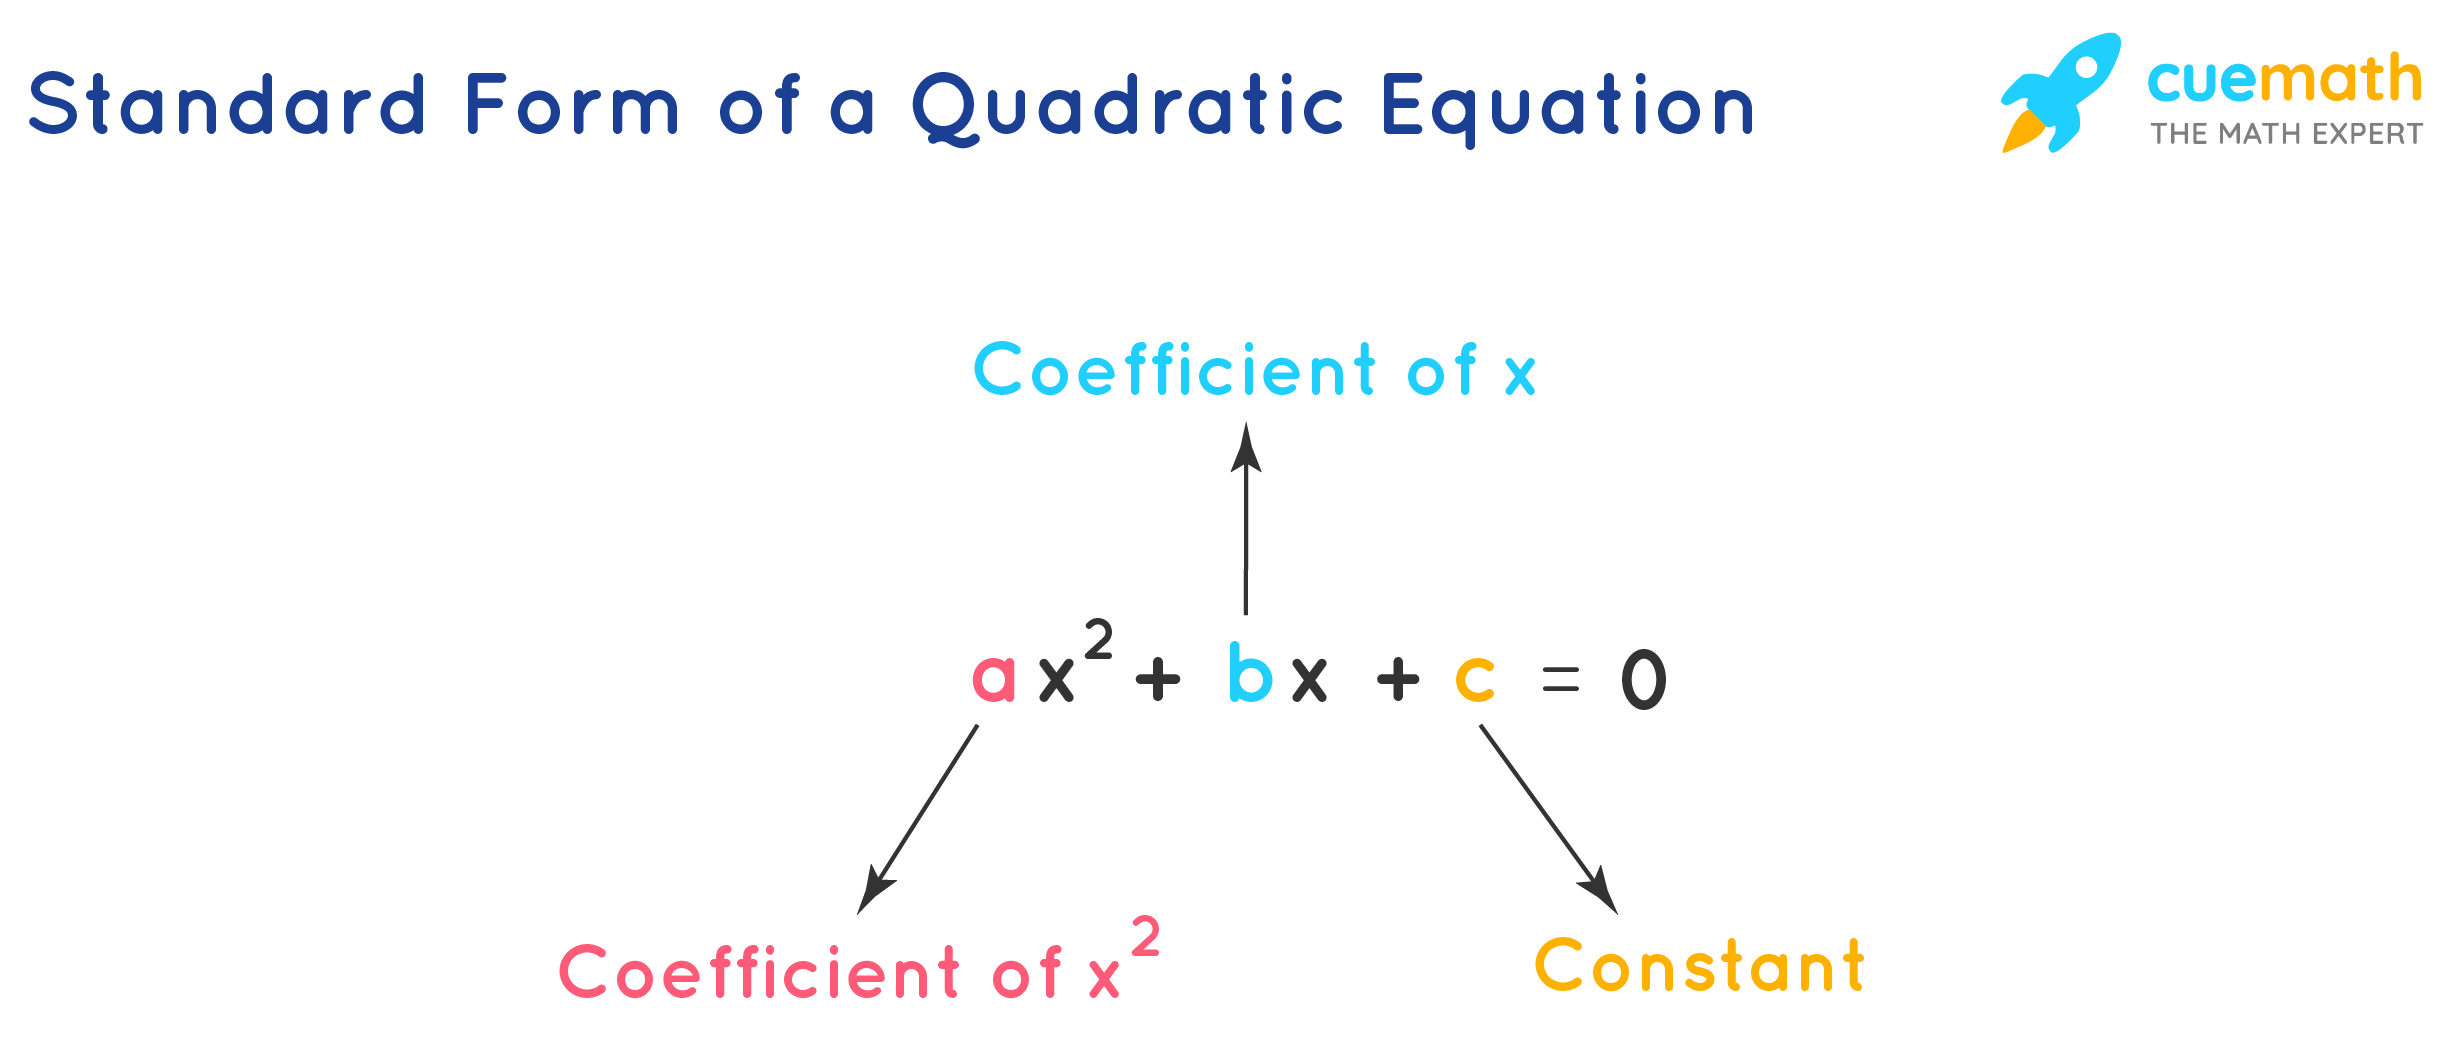 Standard Form of a Quadratic Equation